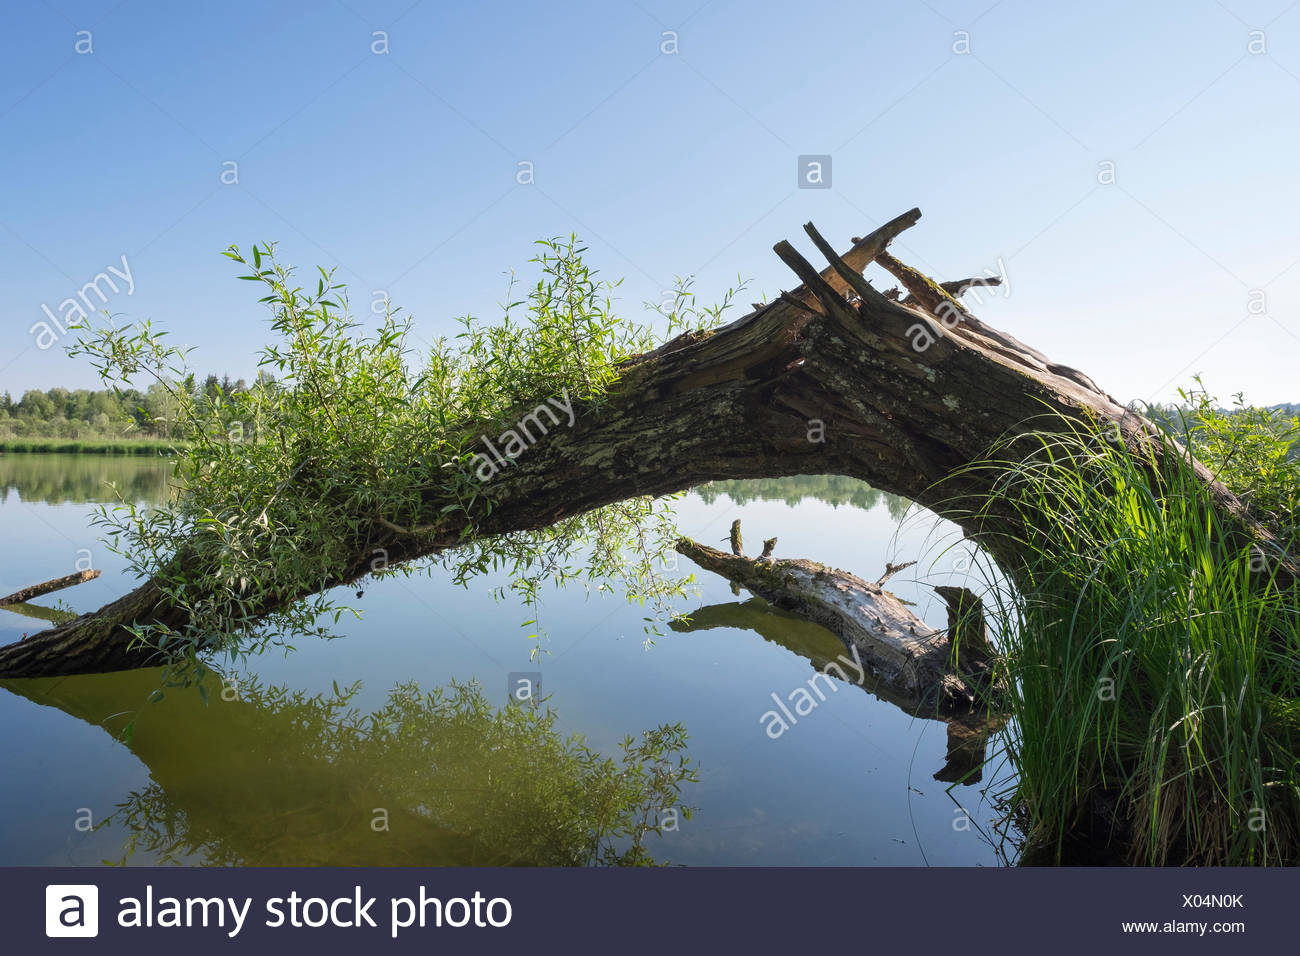 Germany Bavaria Pupplinger Au Icking Reservoir at sar floodplains - Stock Image